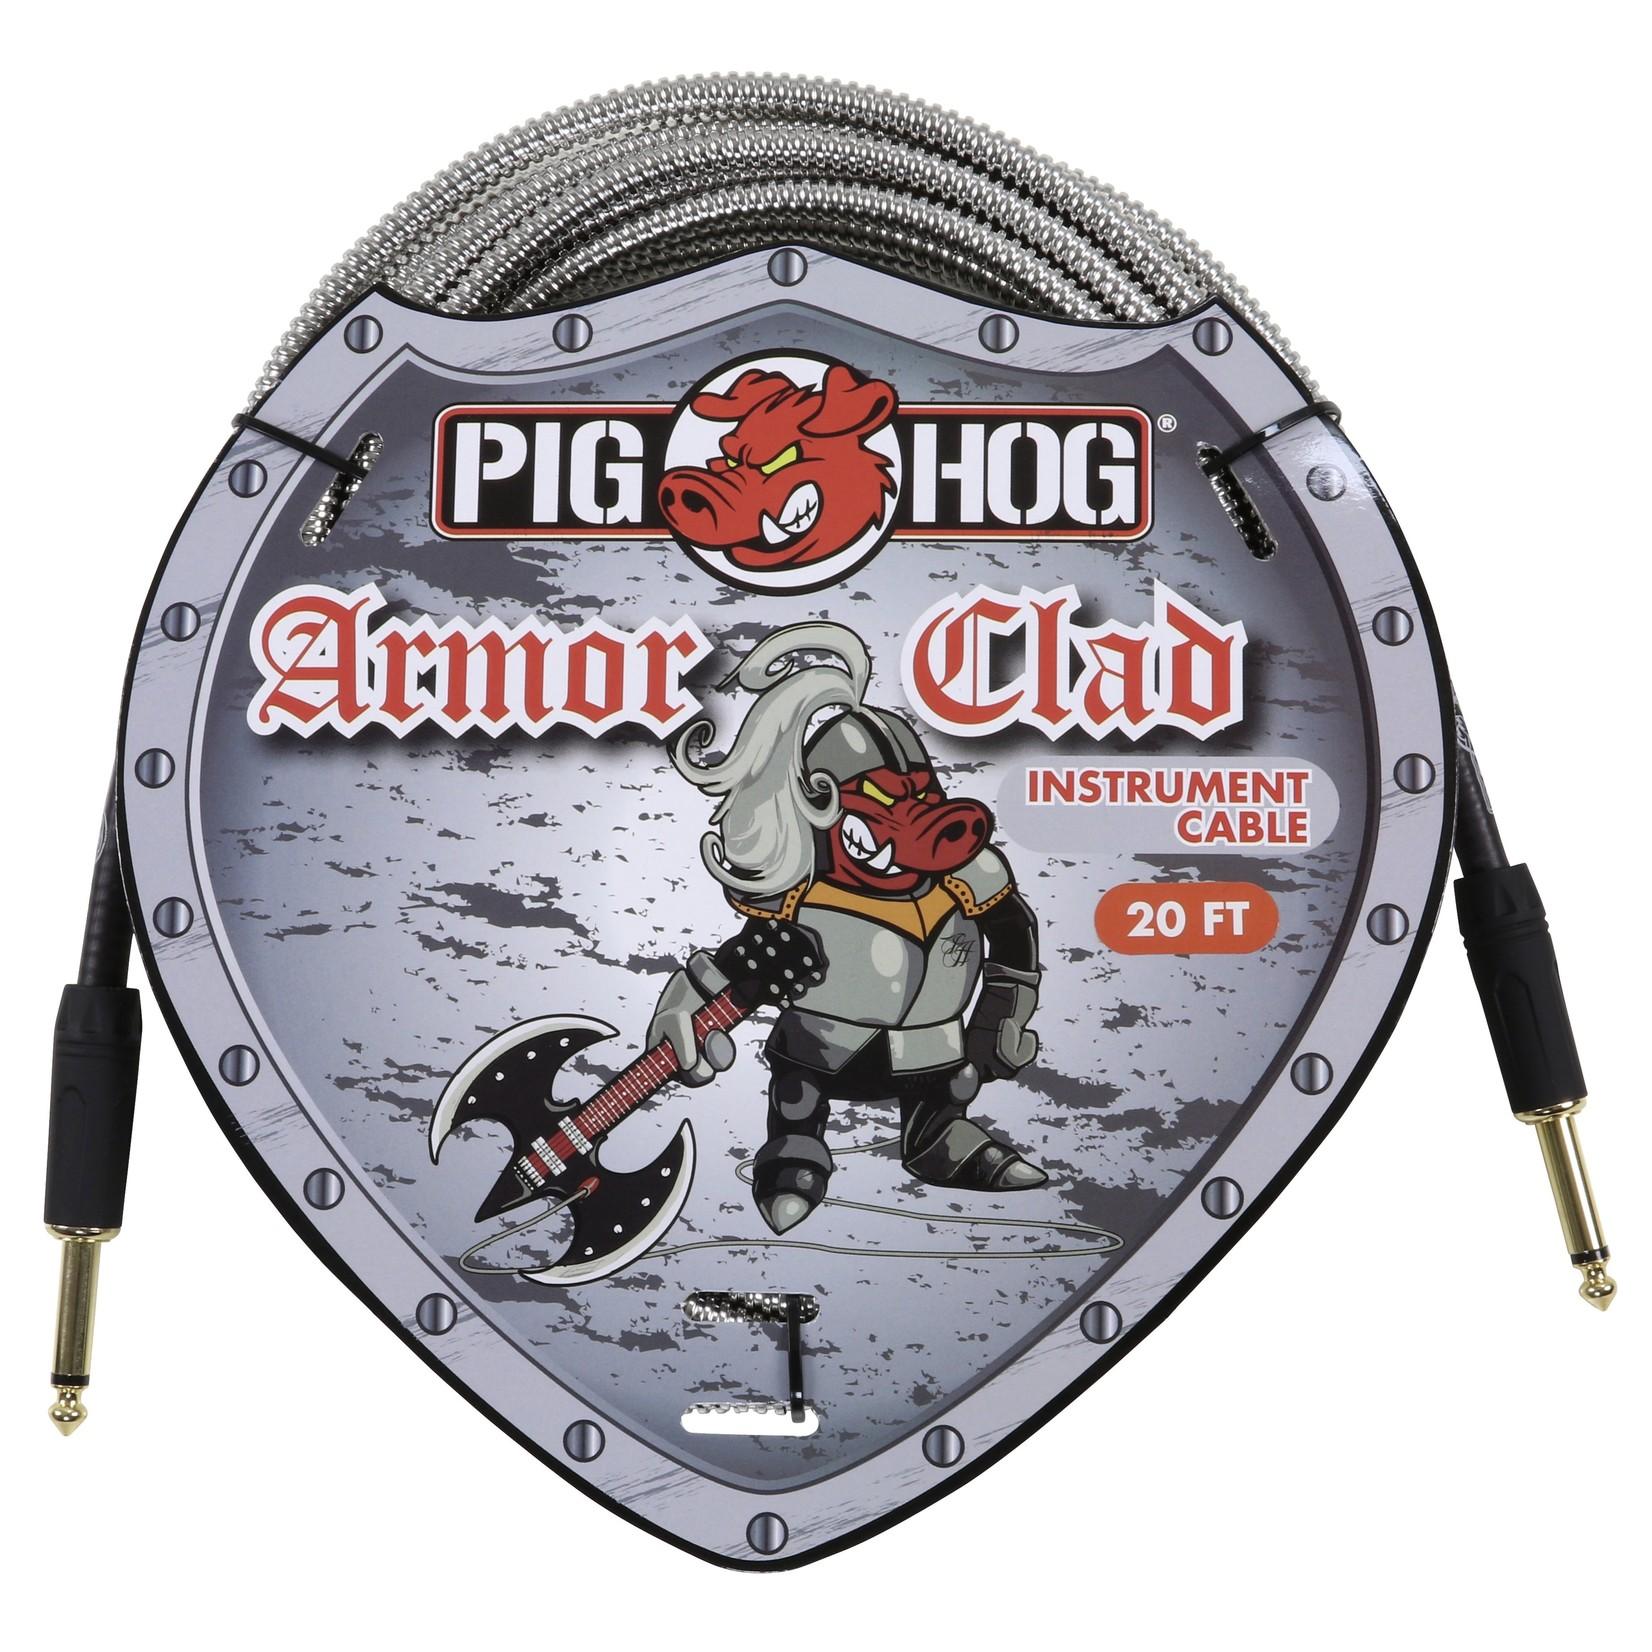 "Pig Hog Pig Hog ""Armor Clad"" Instrument Cable, 20 ft -Vintage Series Industrial Conduit-Style Metal Jacket"